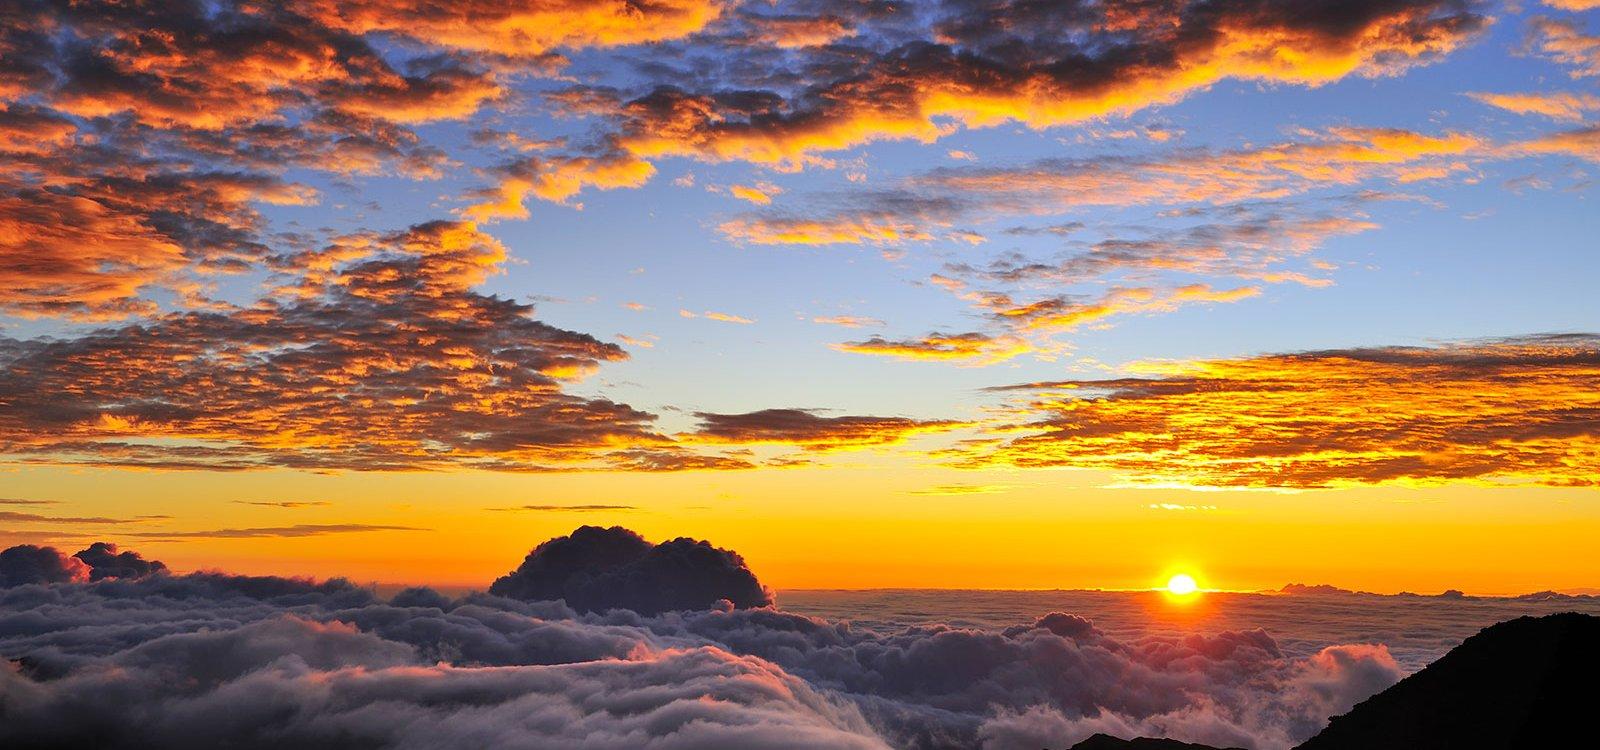 haleakala-sunrise-sunset-times_1600_750_85_s_c1_c_c_0_0.jpg.pagespeed.ce.B8sCfohChz